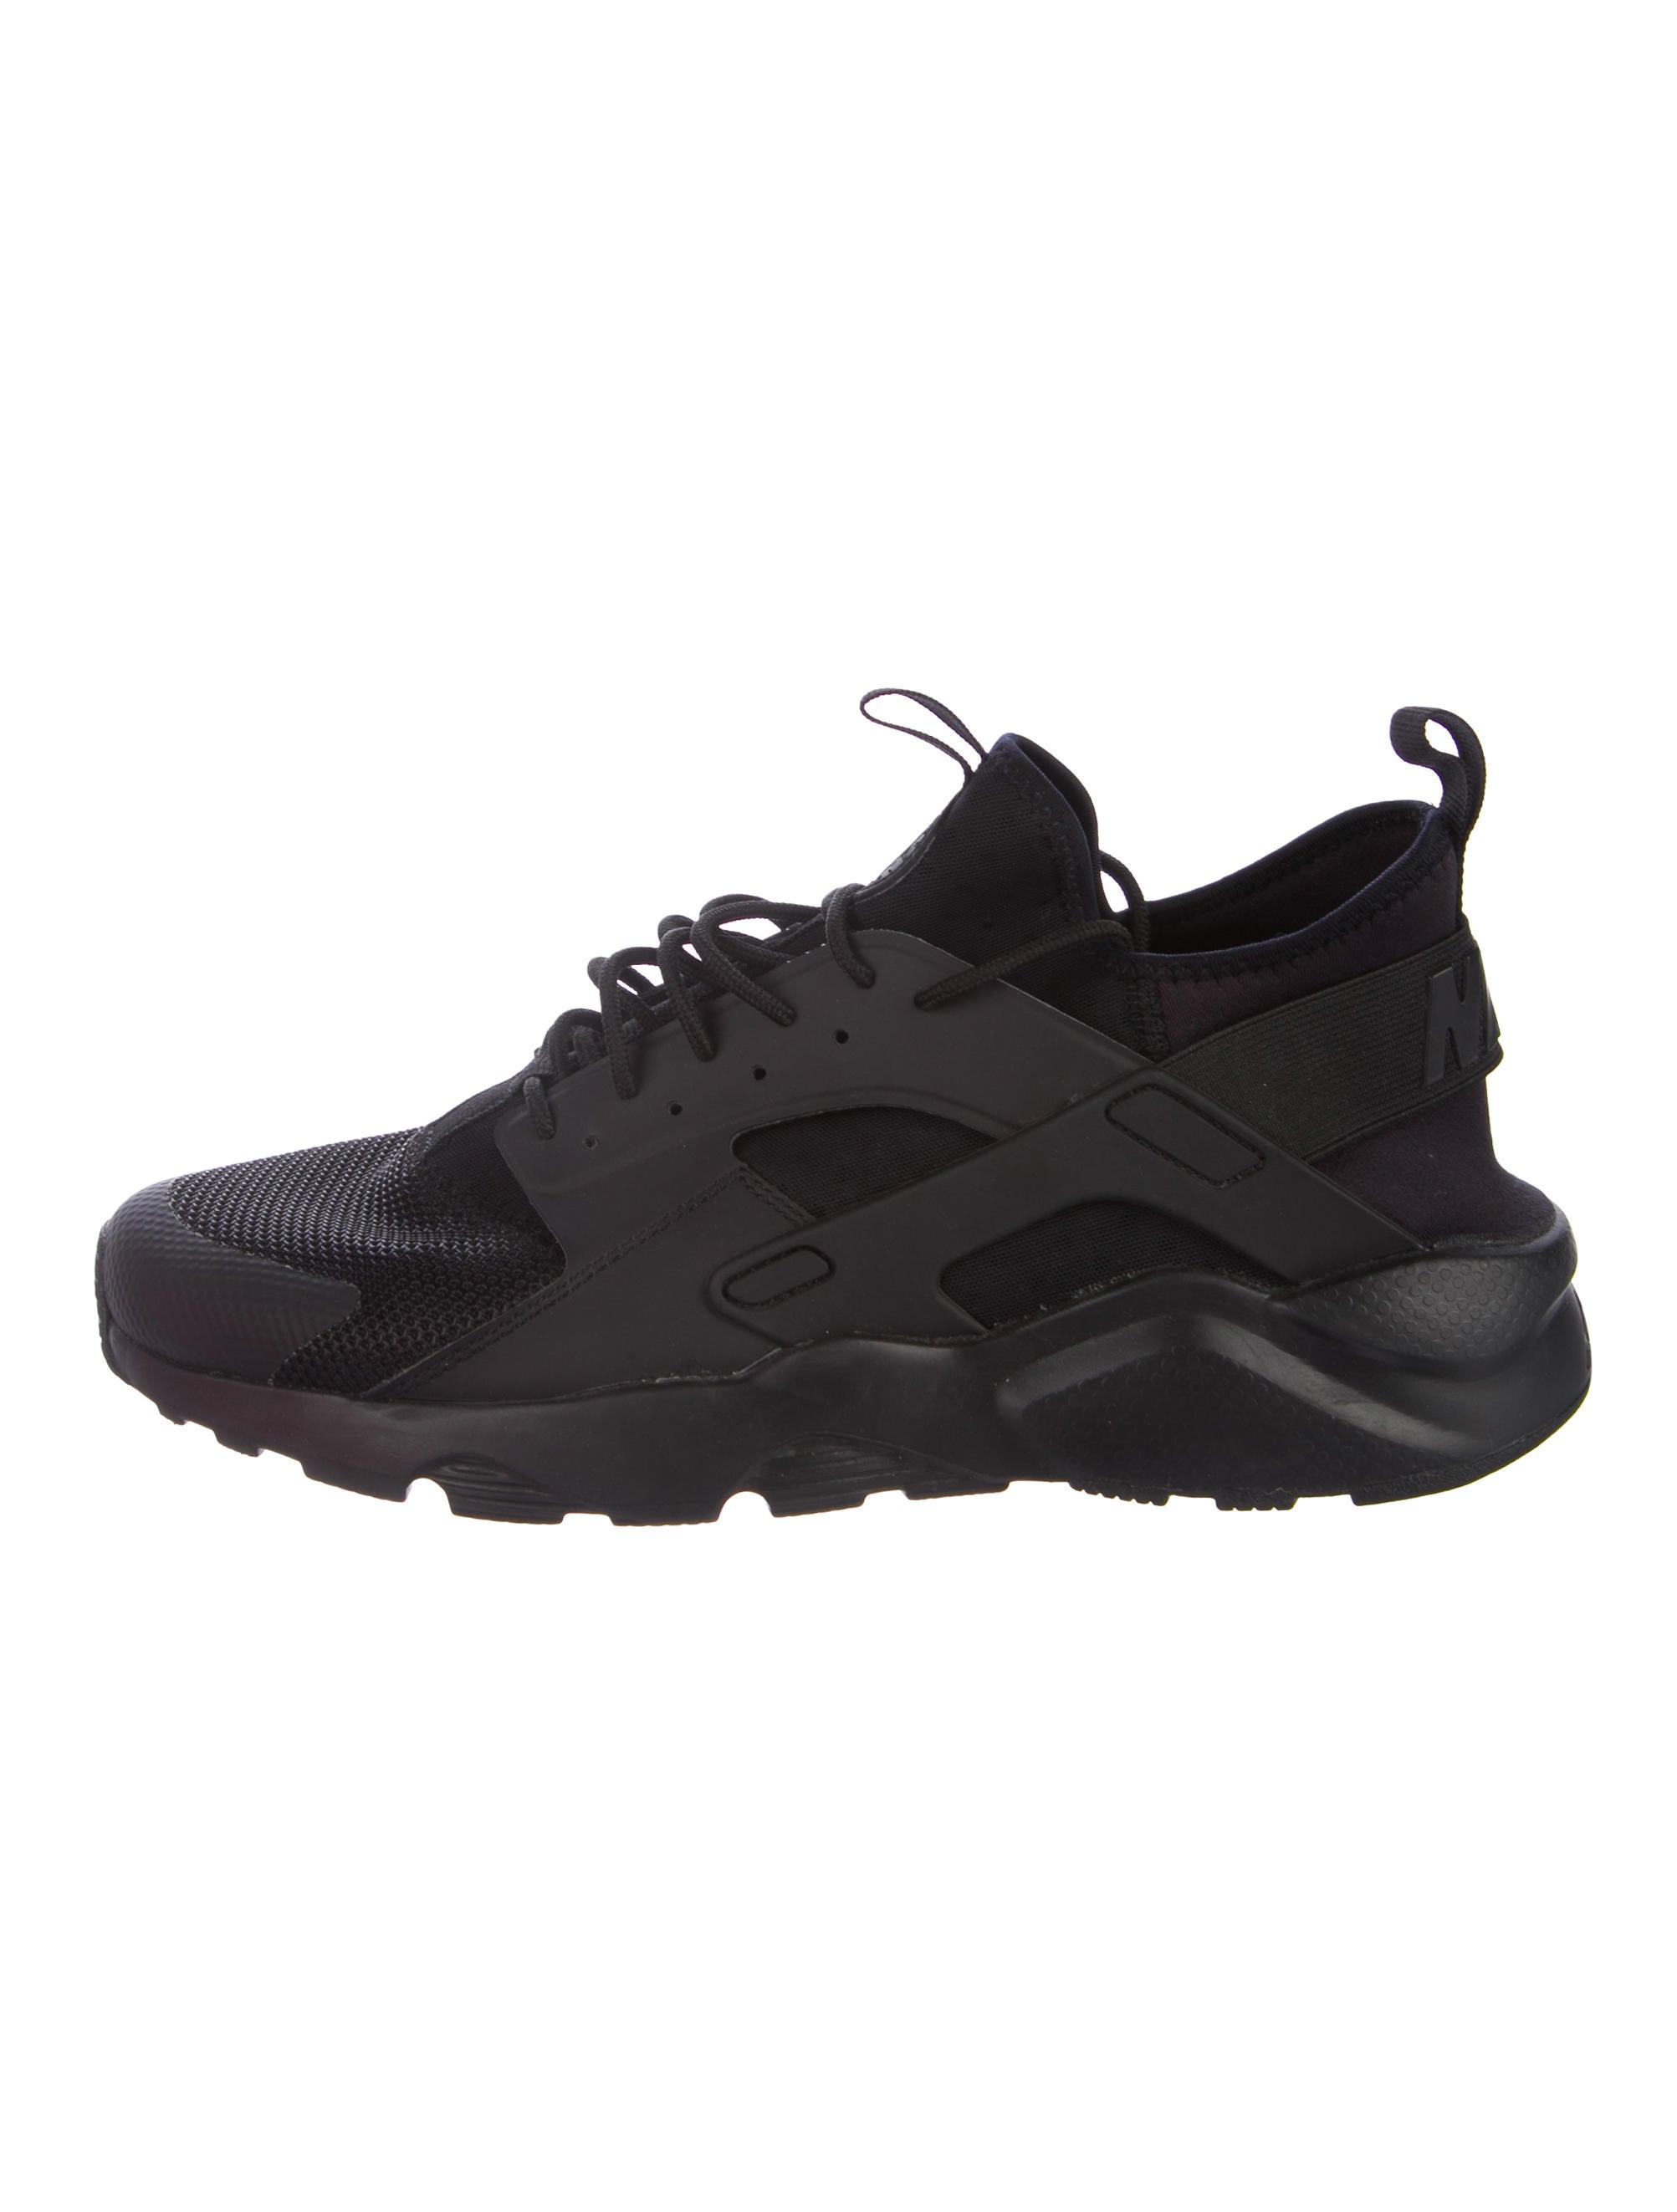 fc08248792b9 shop nike air huarache drift mens shoe 93ffd 3b766  real huarache low top  sneakers 245c4 f6bc8